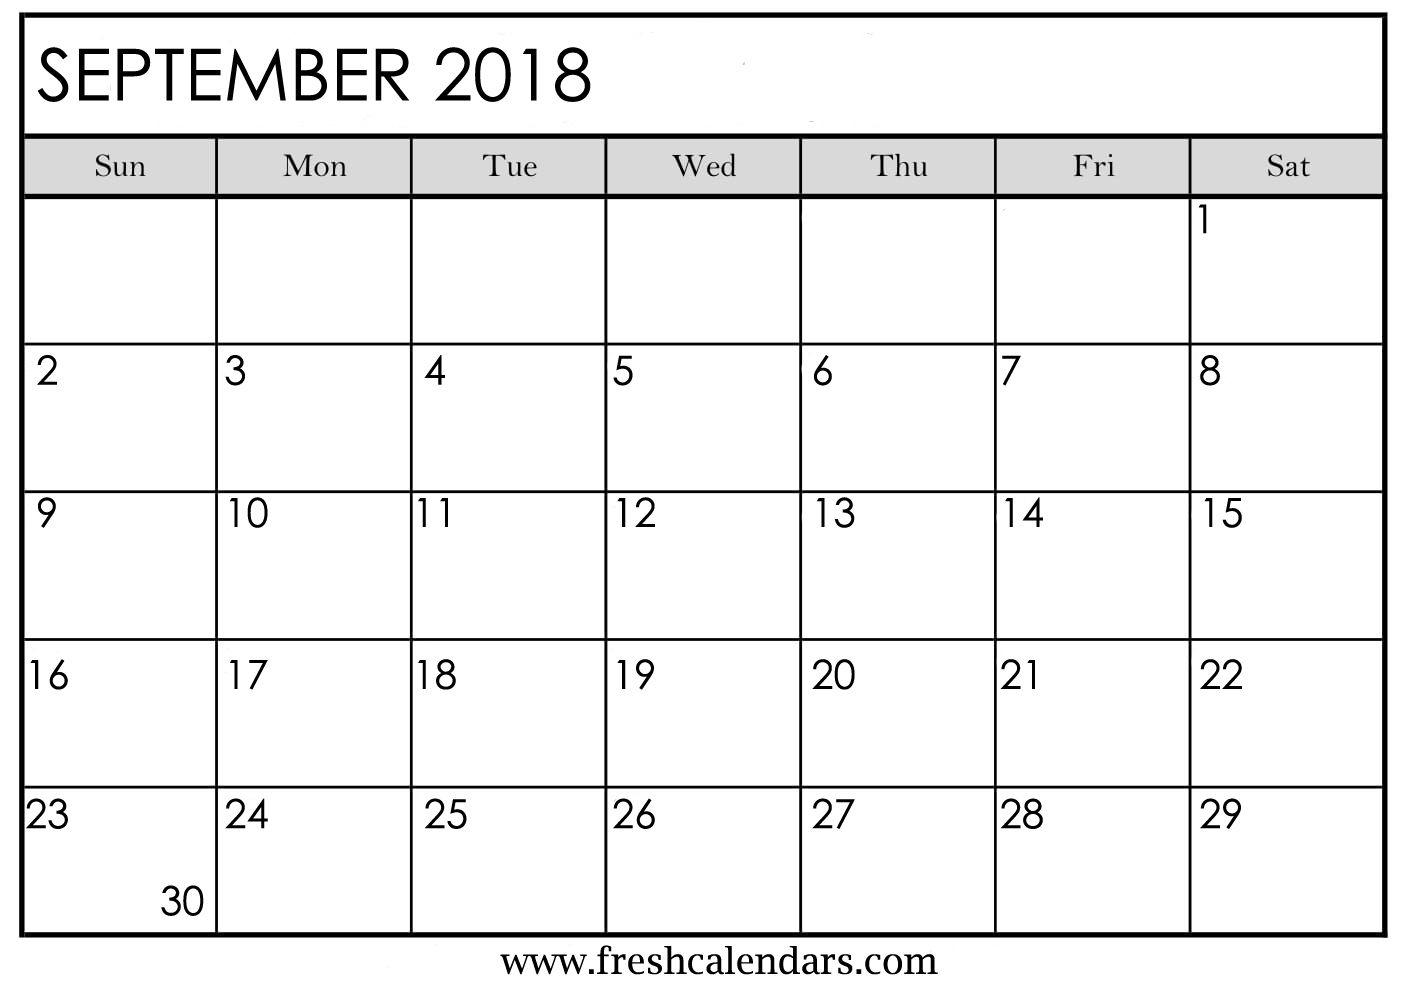 September 2018 Calendar Printable - Fresh Calendars throughout Calendar Of The Month Of September